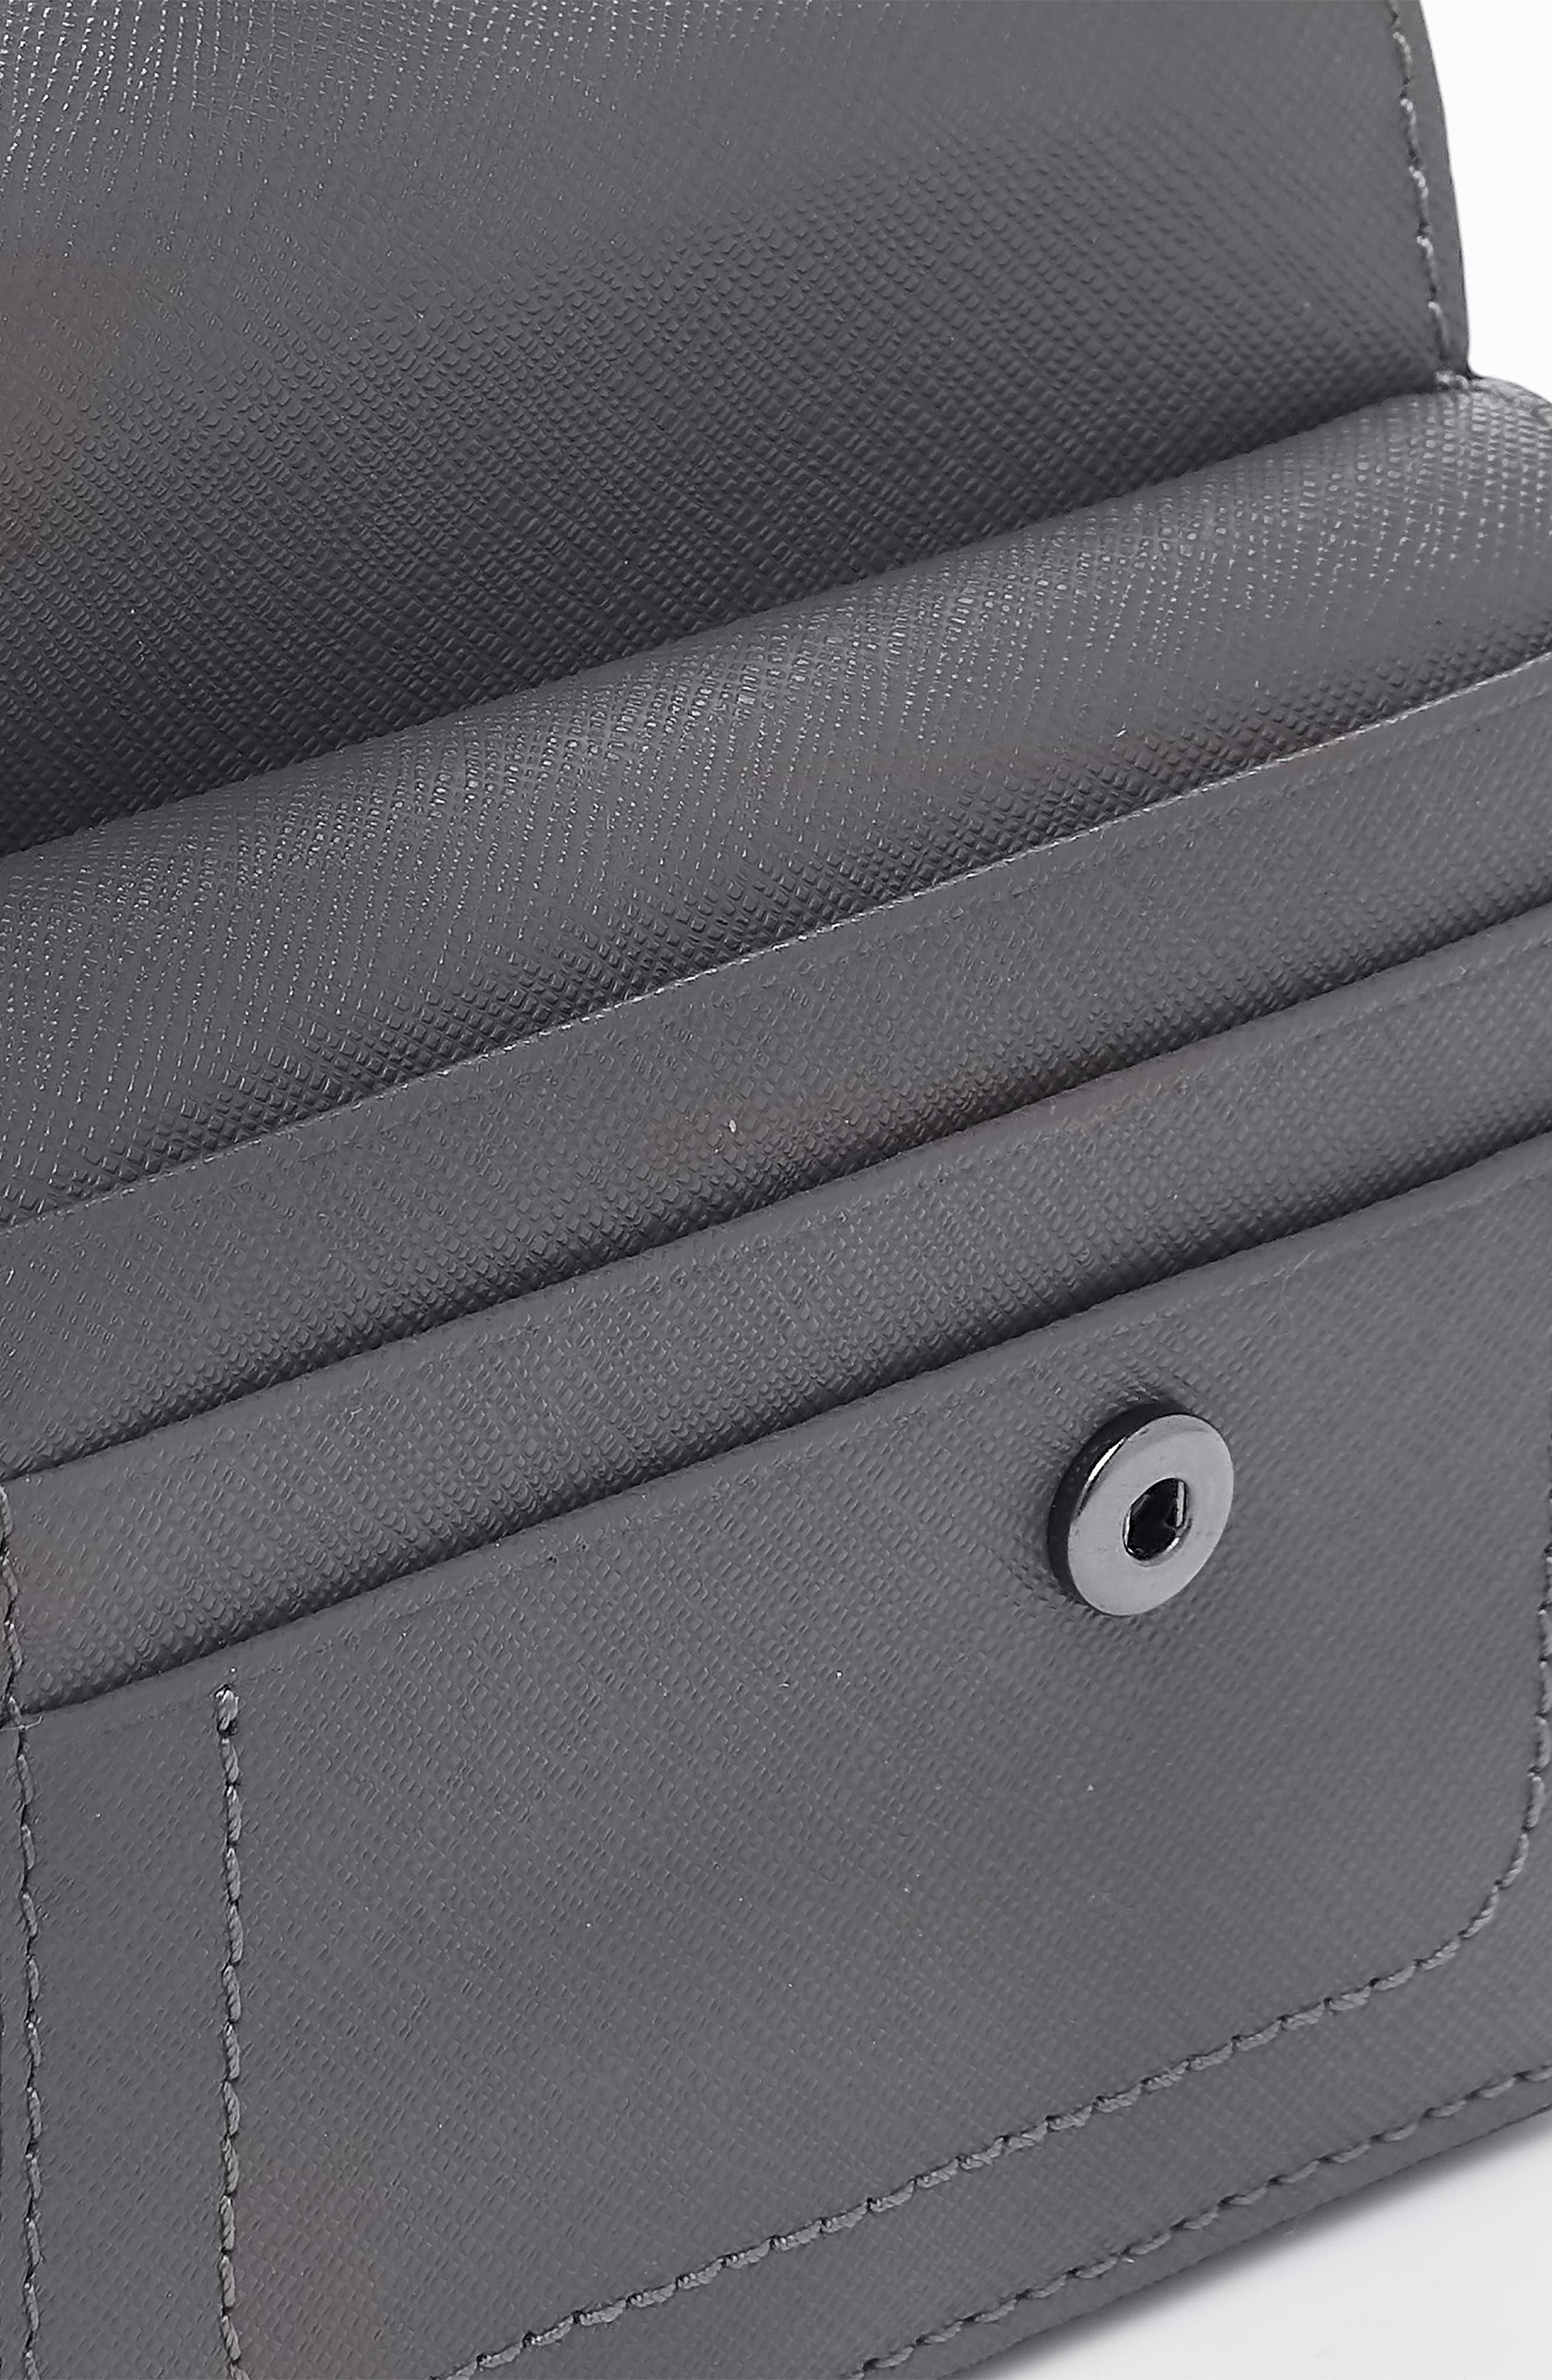 BOTKIER,                             Mini Cobble Hill Colorblock Leather Wallet,                             Alternate thumbnail 4, color,                             PEWTER COMBO